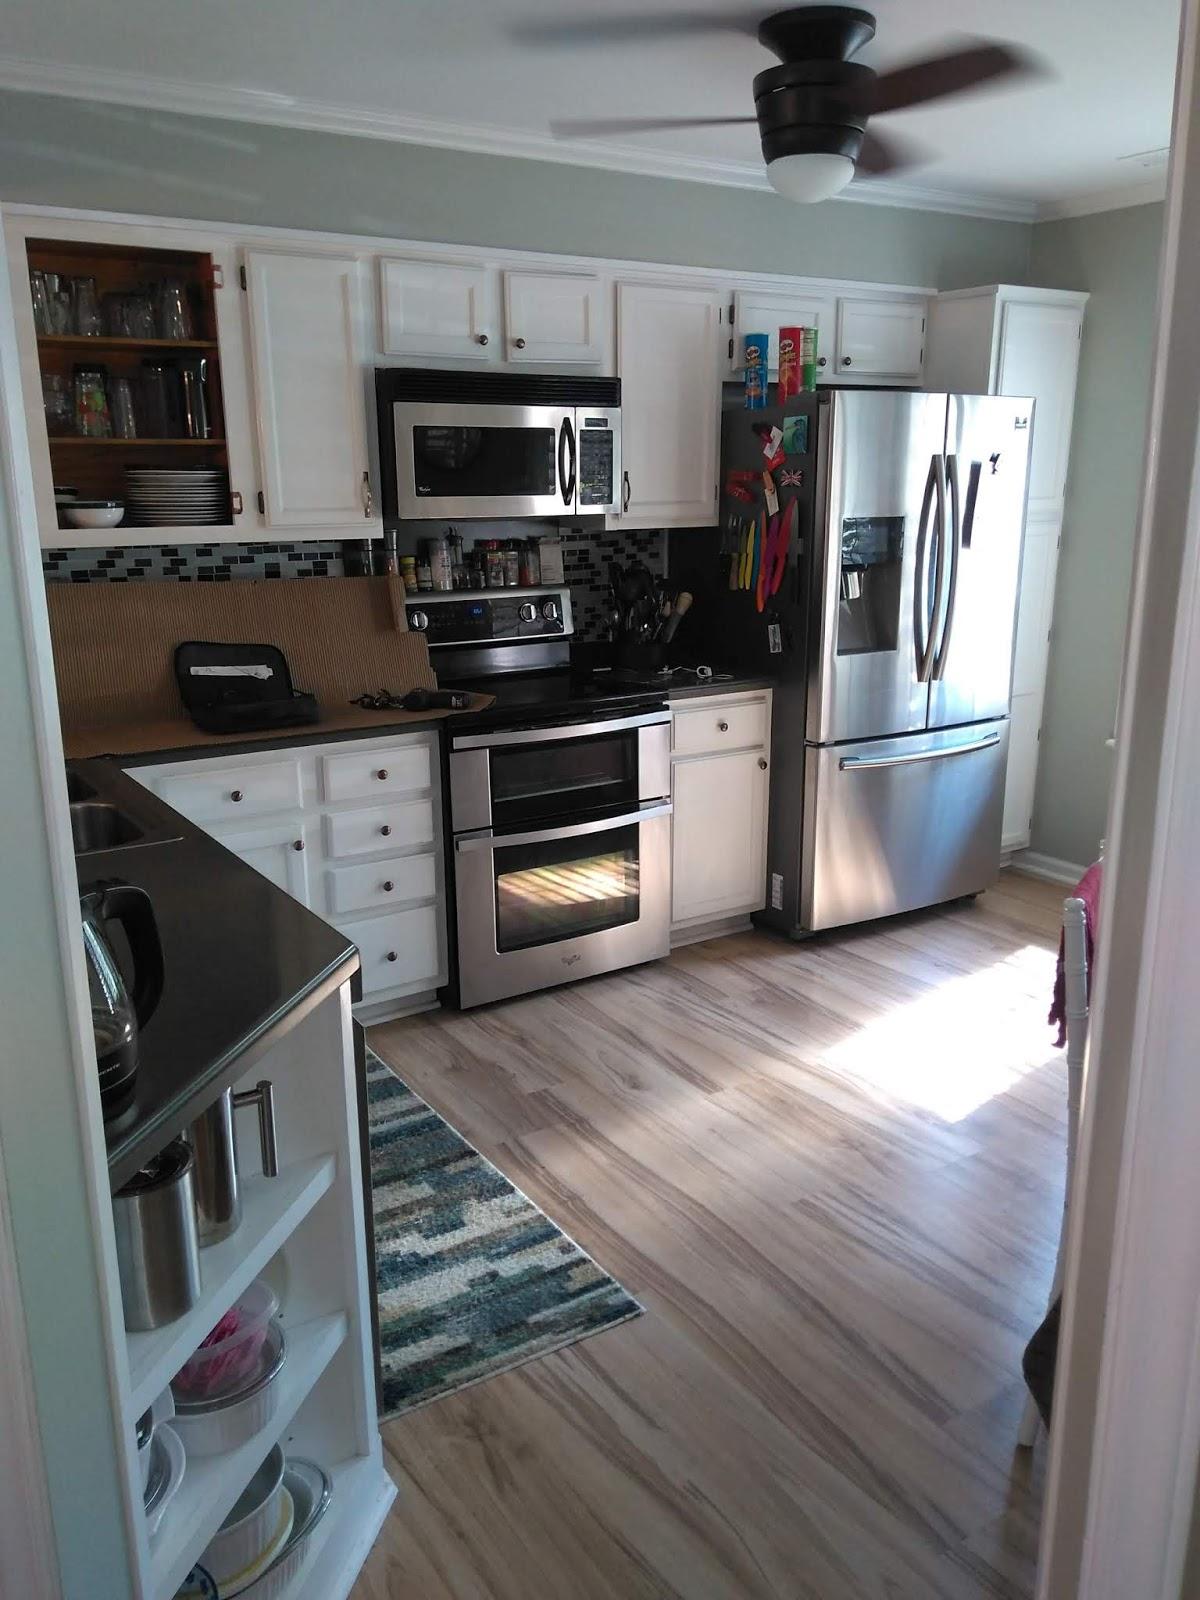 Bob's Kitchen Cabinet Refacing | Serving Charlotte NC Area